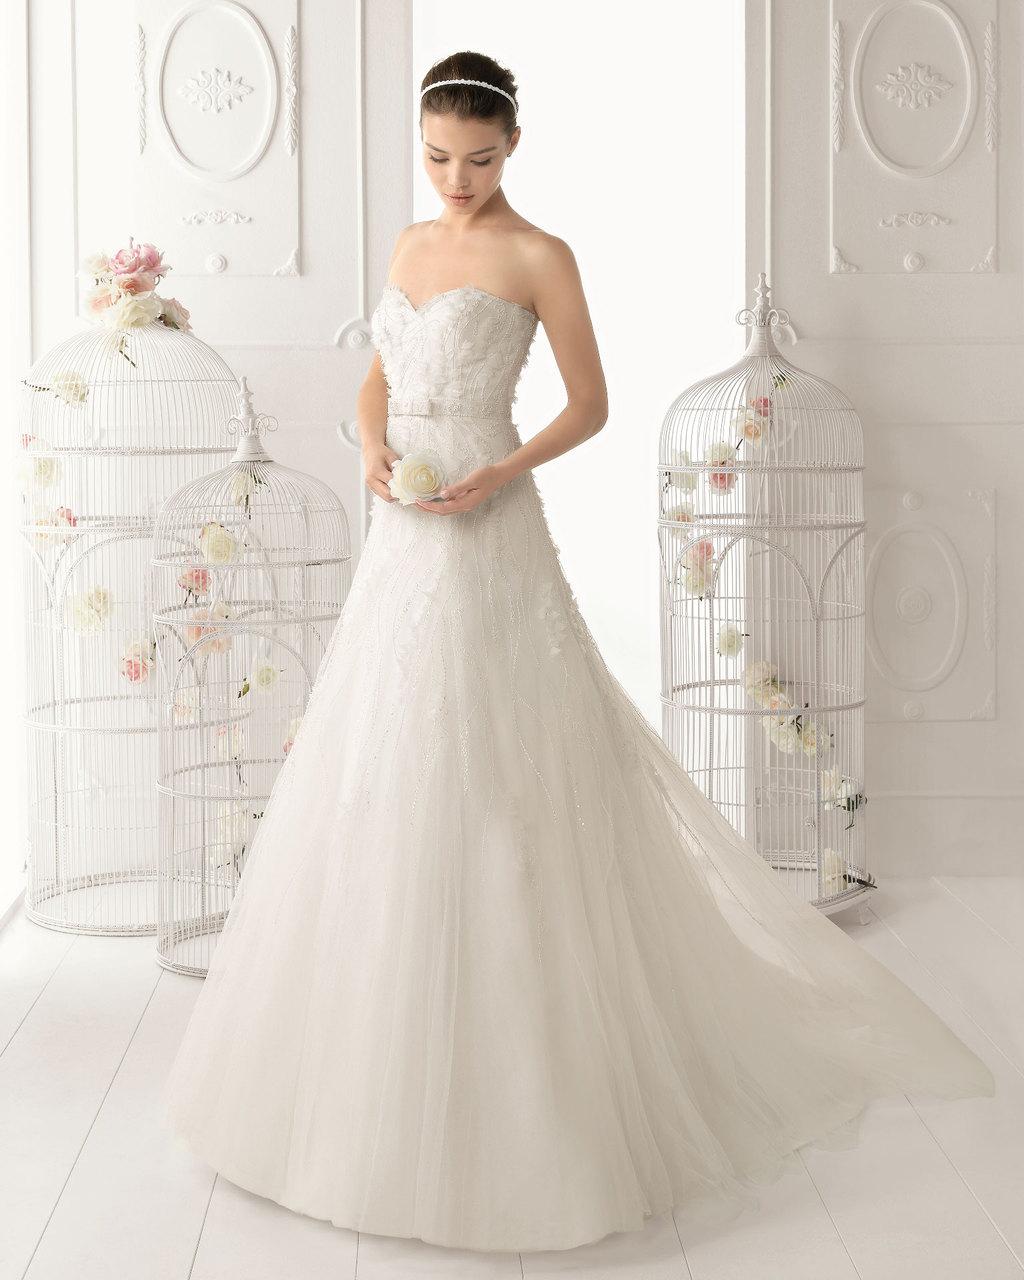 Aire-barcelona-wedding-dress-2014-bridal-odil.full